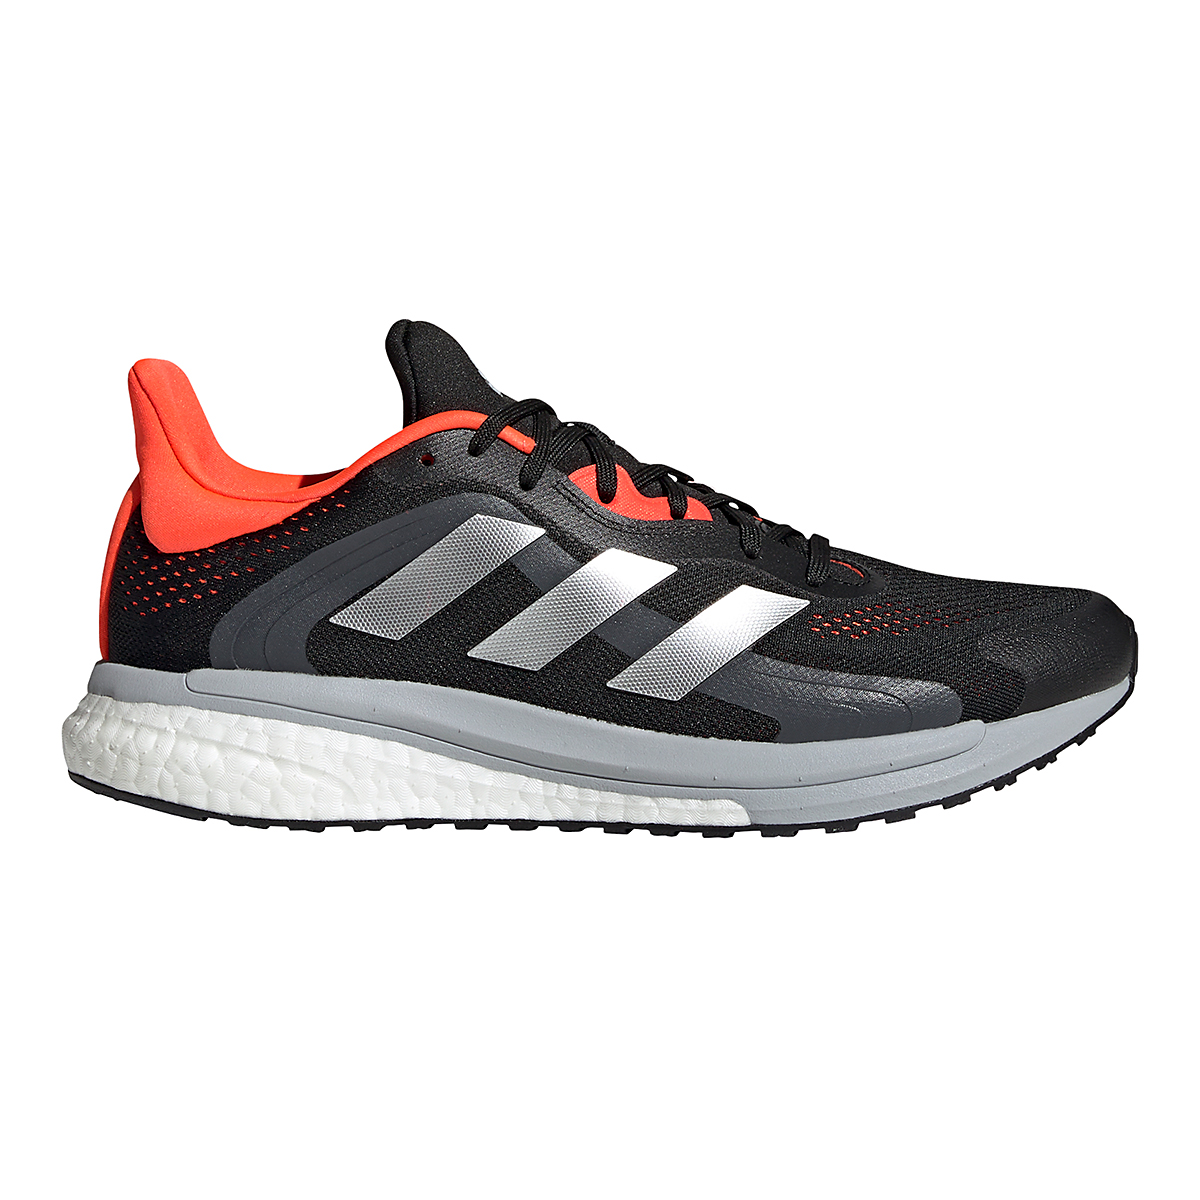 Men's Adidas Solar Glide 4 ST Running Shoe - Color: Core Black/Grey/Solar Red - Size: 6.5 - Width: Regular, Core Black/Grey/Solar Red, large, image 1